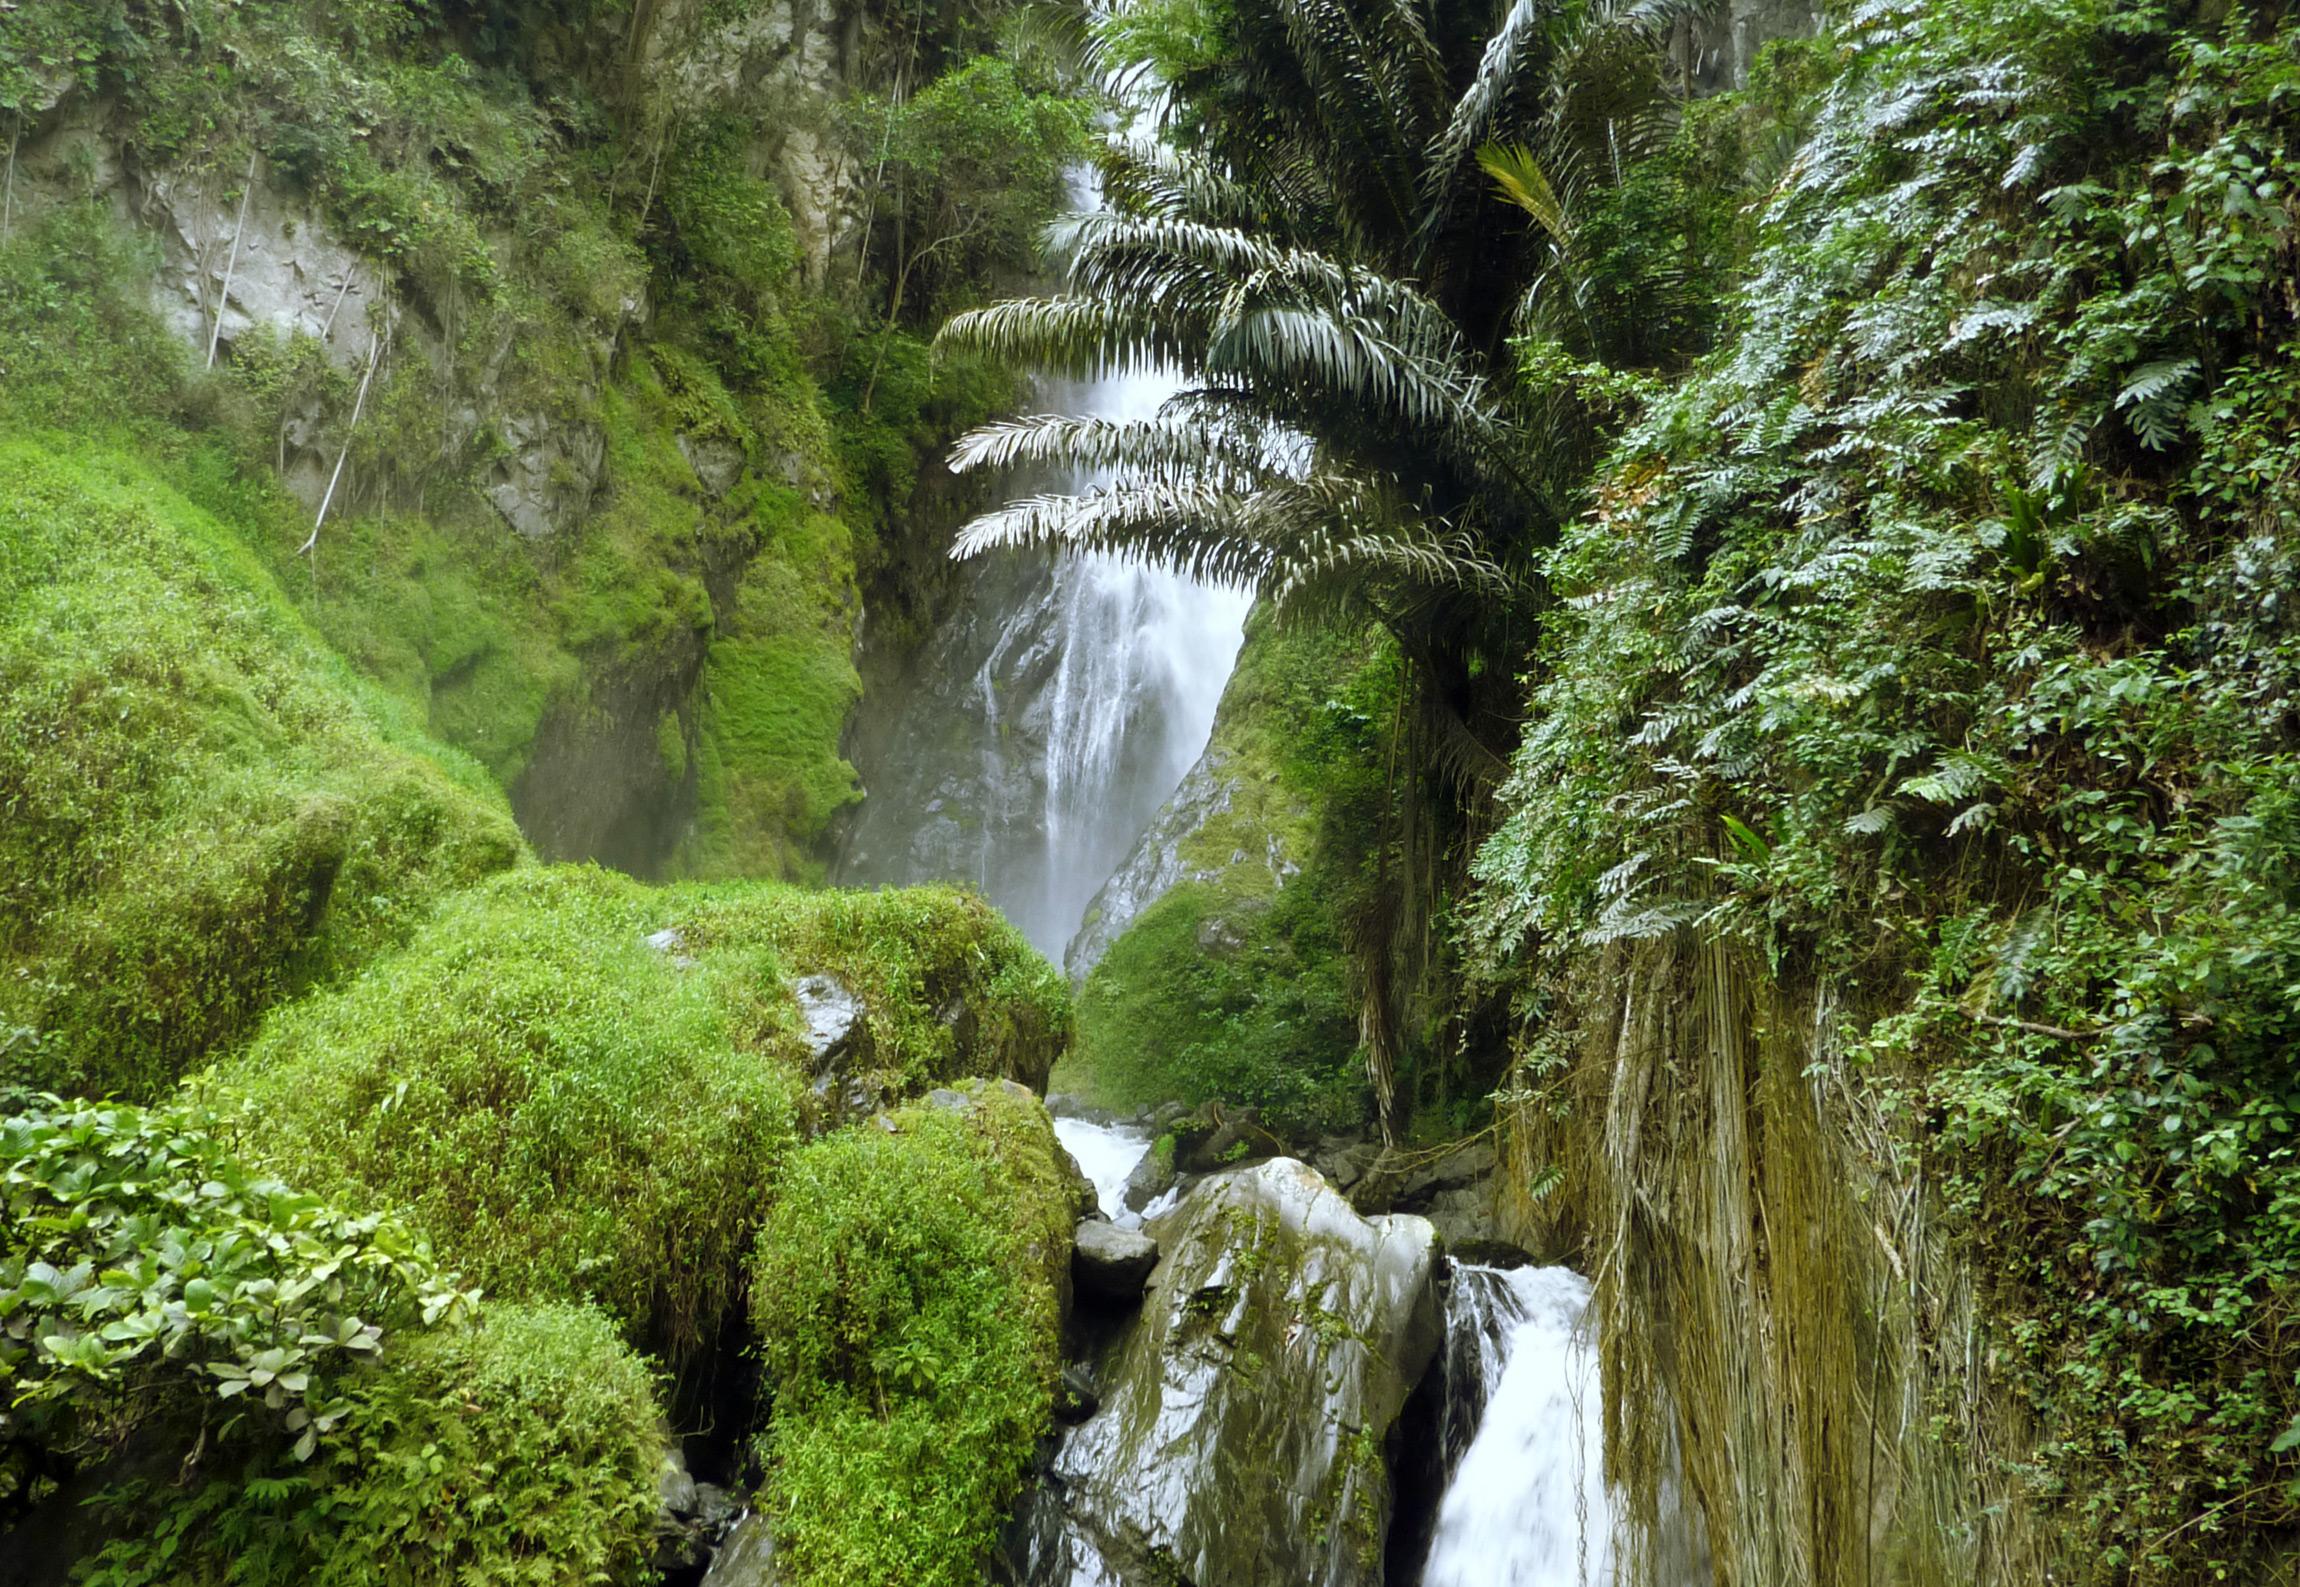 Sulewana-Wasserfall auf Sulawesi